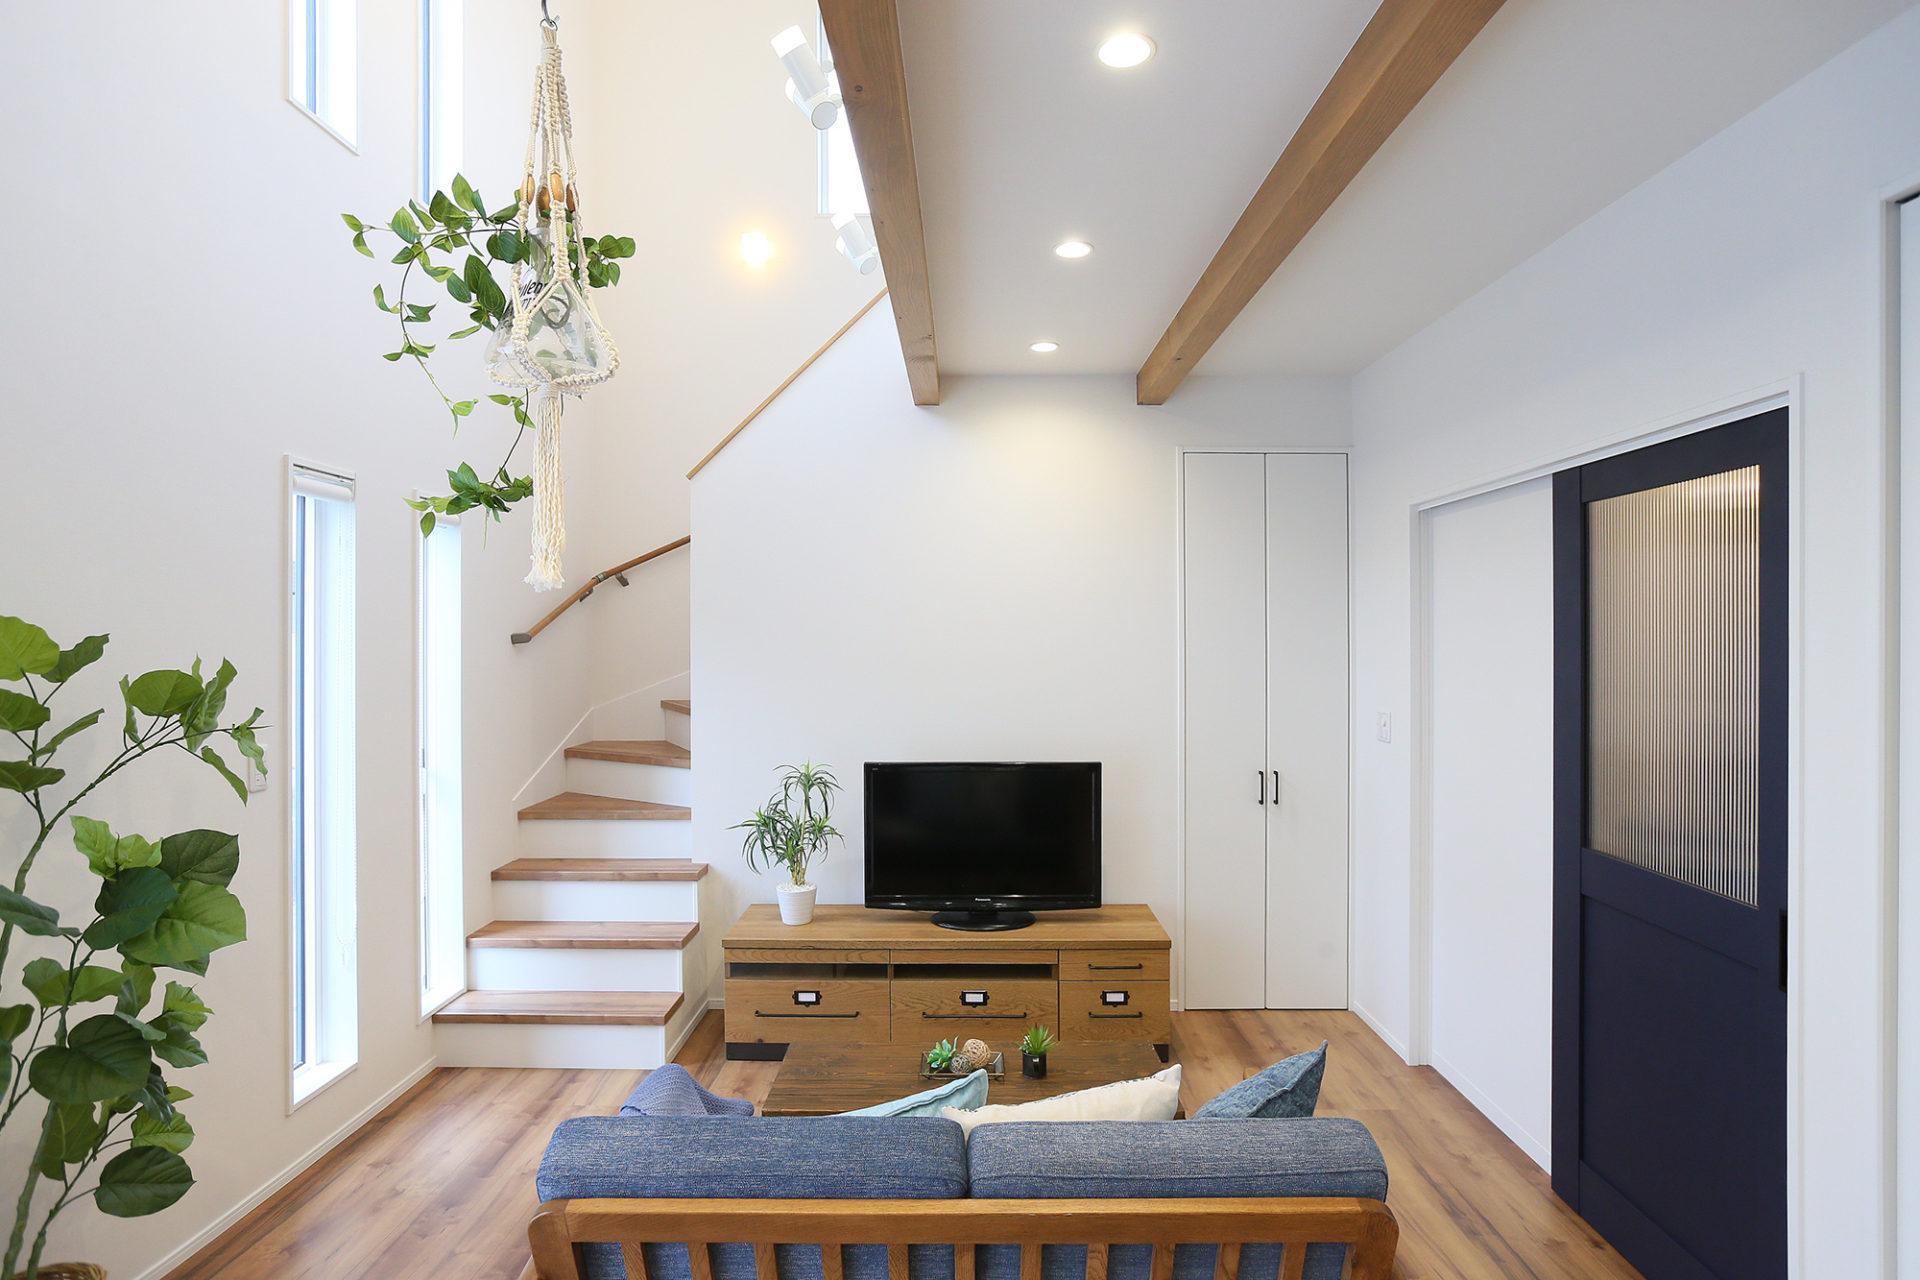 Shiawaseya-笑顔あふれる 幸せな毎日が過ごせる中野市の家